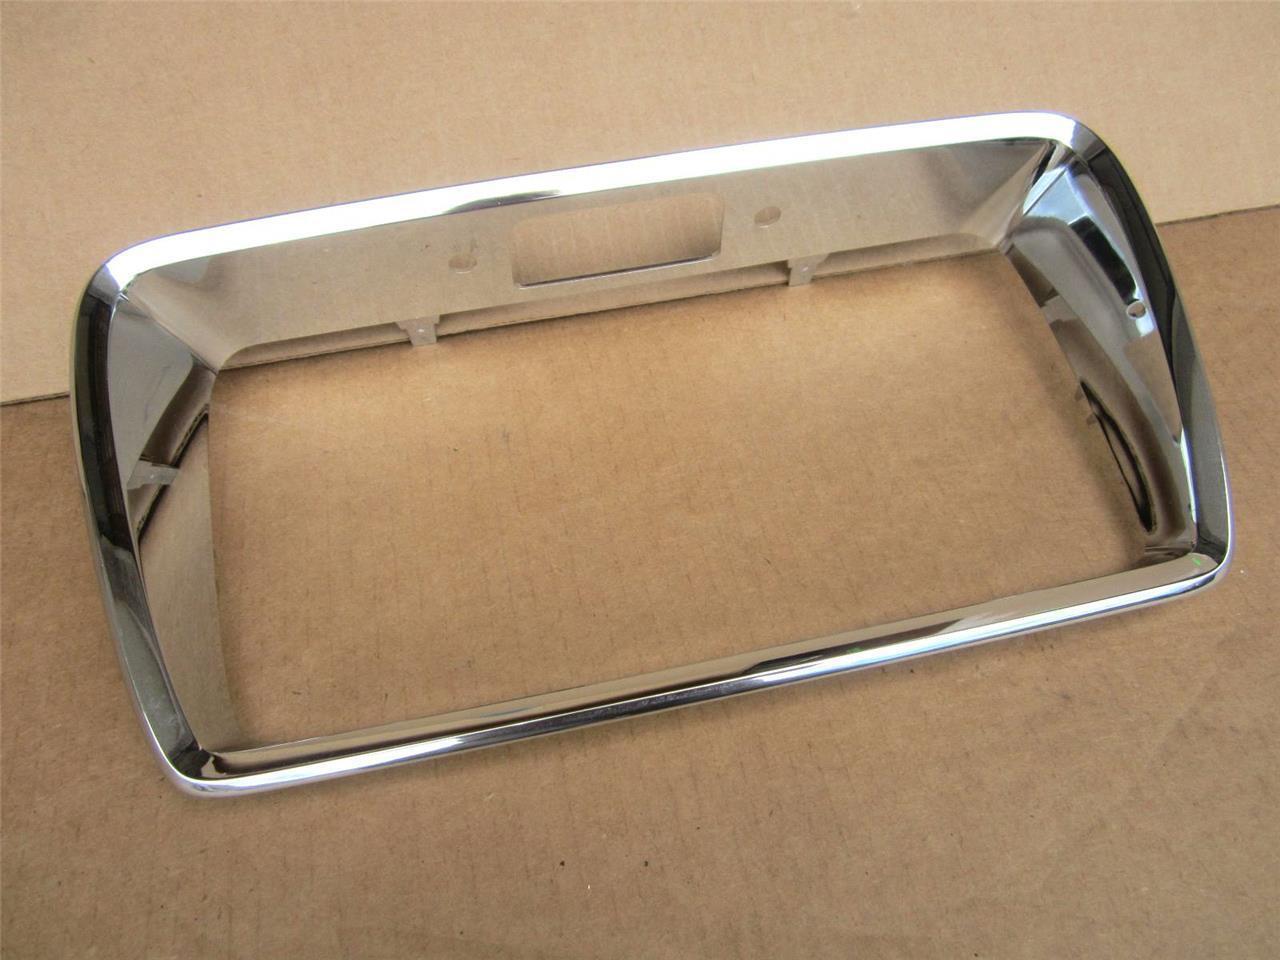 OEM 2008-2012 Chevrolet Malibu Chrome License Molding Trim Surround 15831264